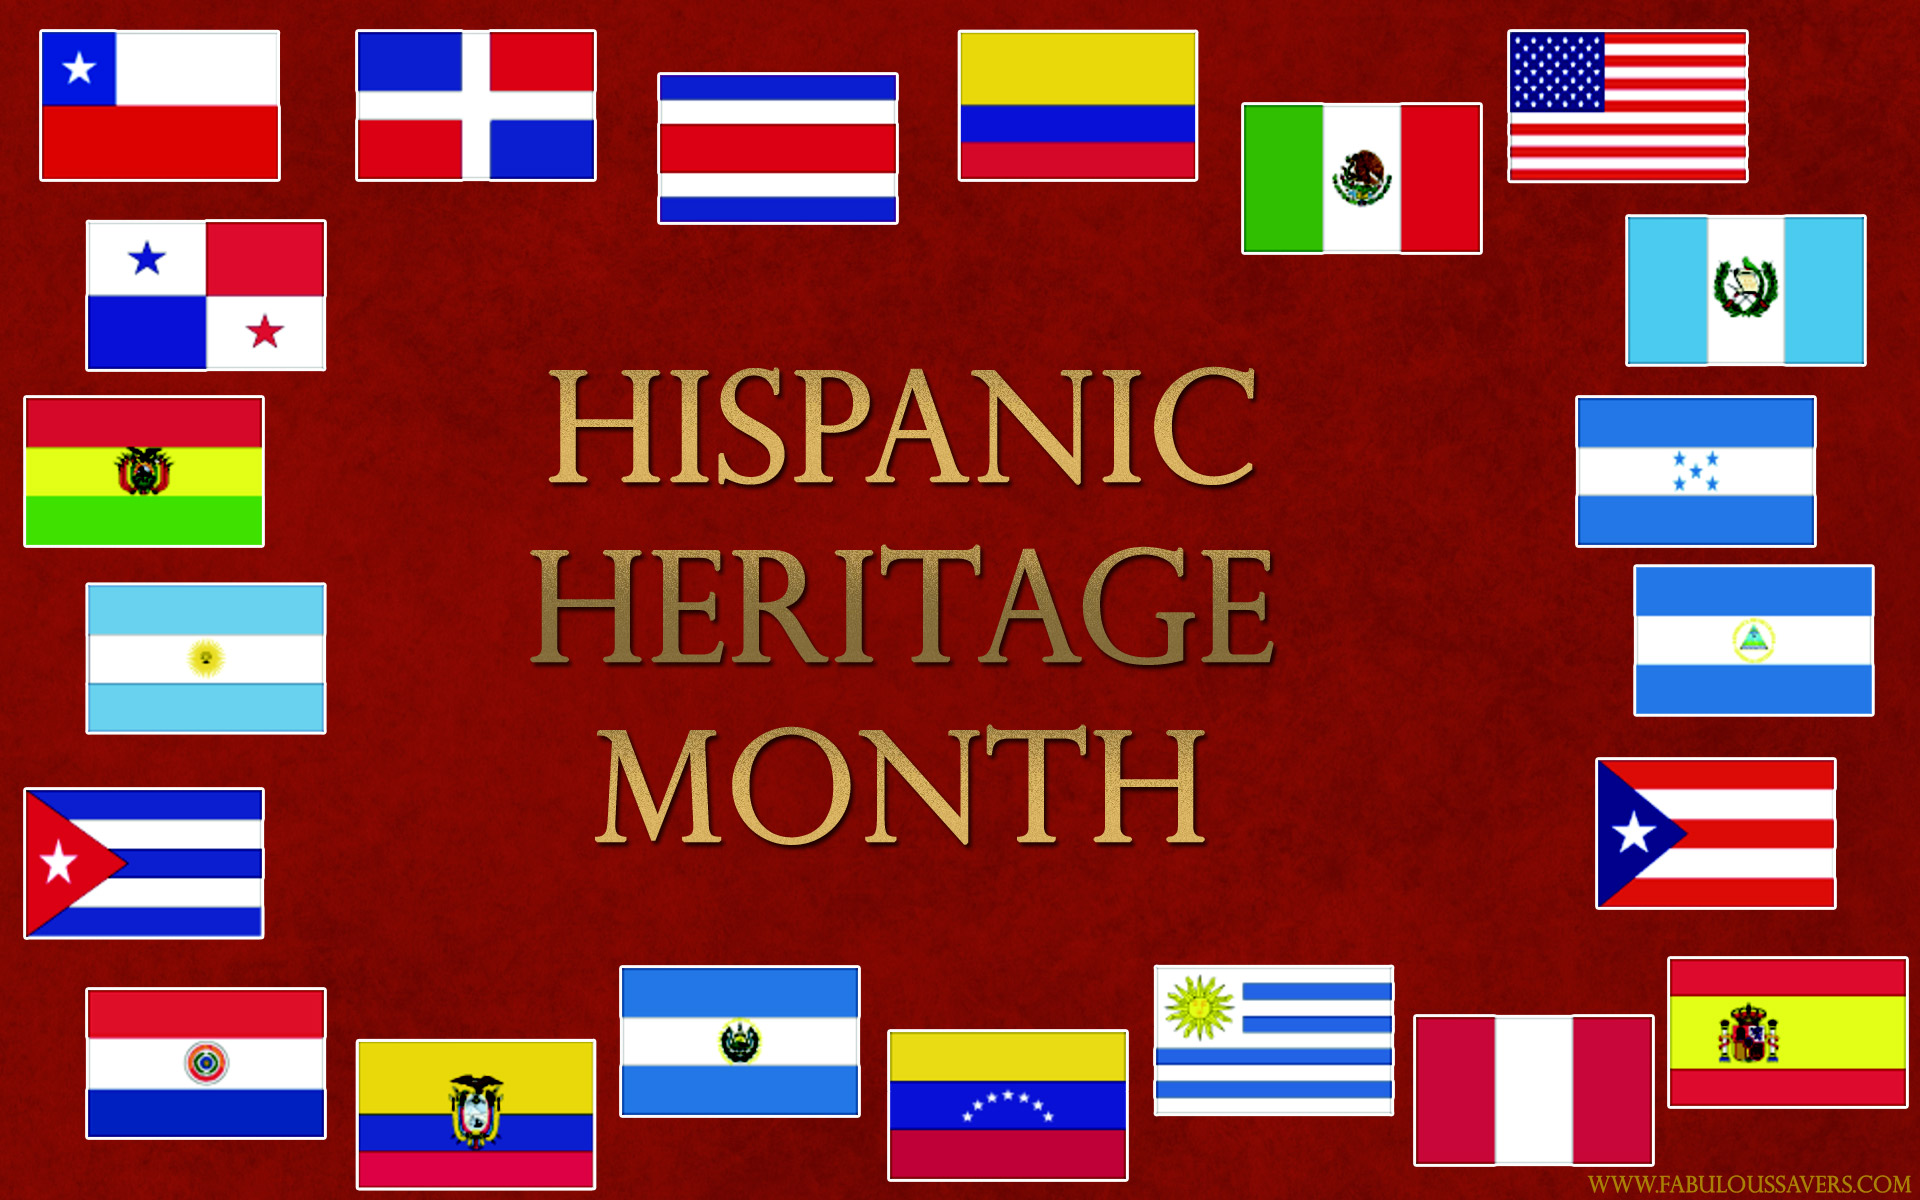 Hispanic Heritage Month computer desktop wallpapers pictures 1920x1200